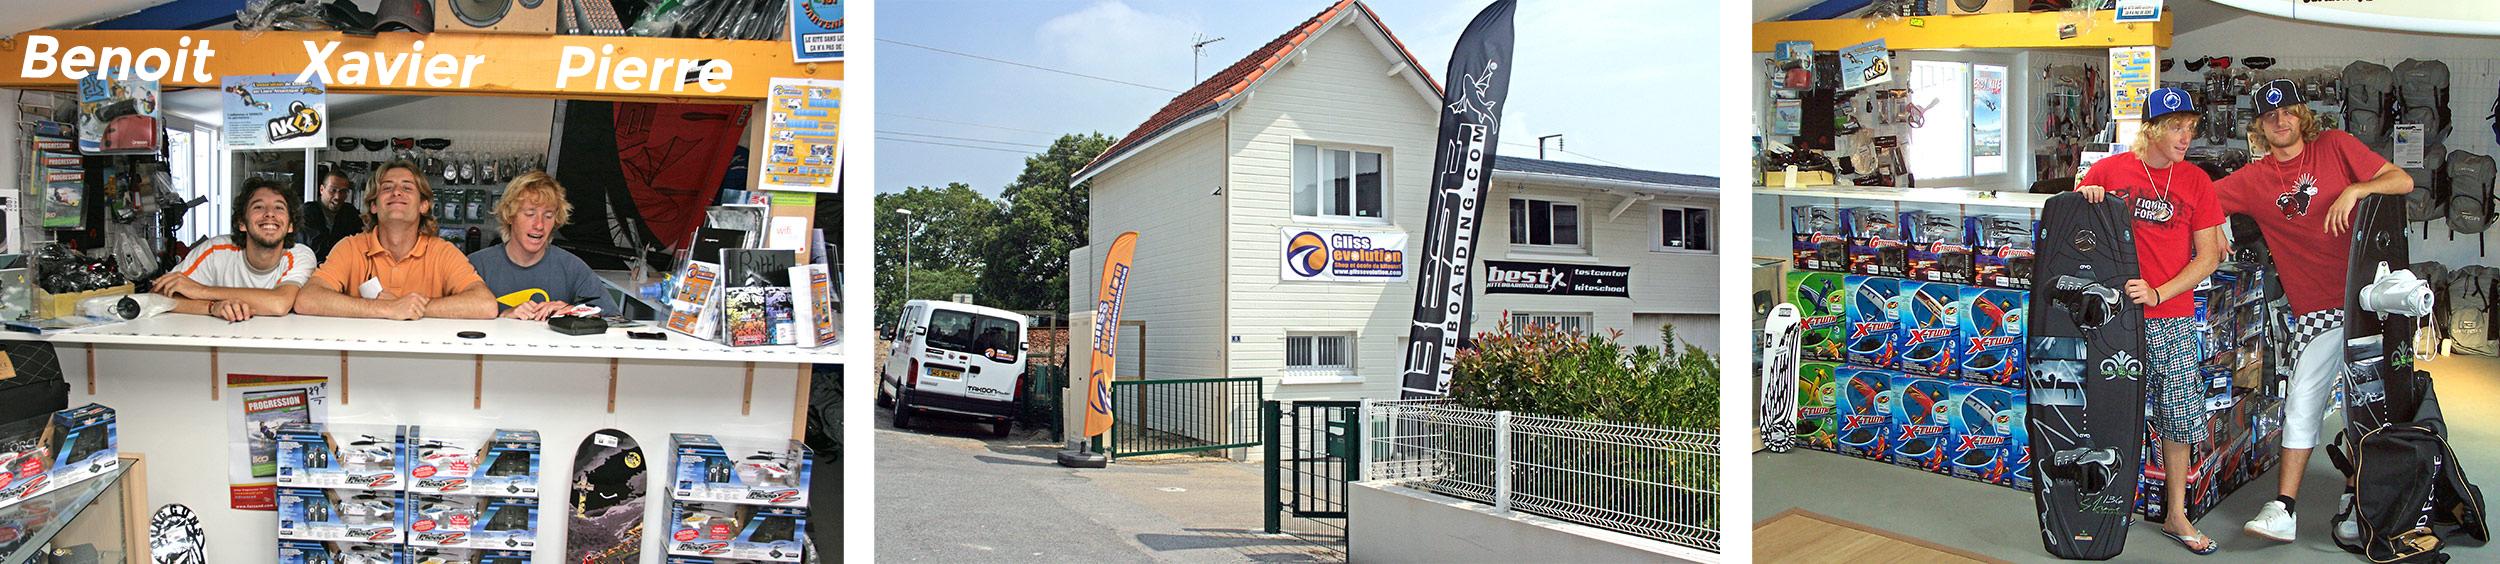 2006-shop-magasin-ecole-kitesurf-la-baule-pornichet-gare-best-kiteboarding